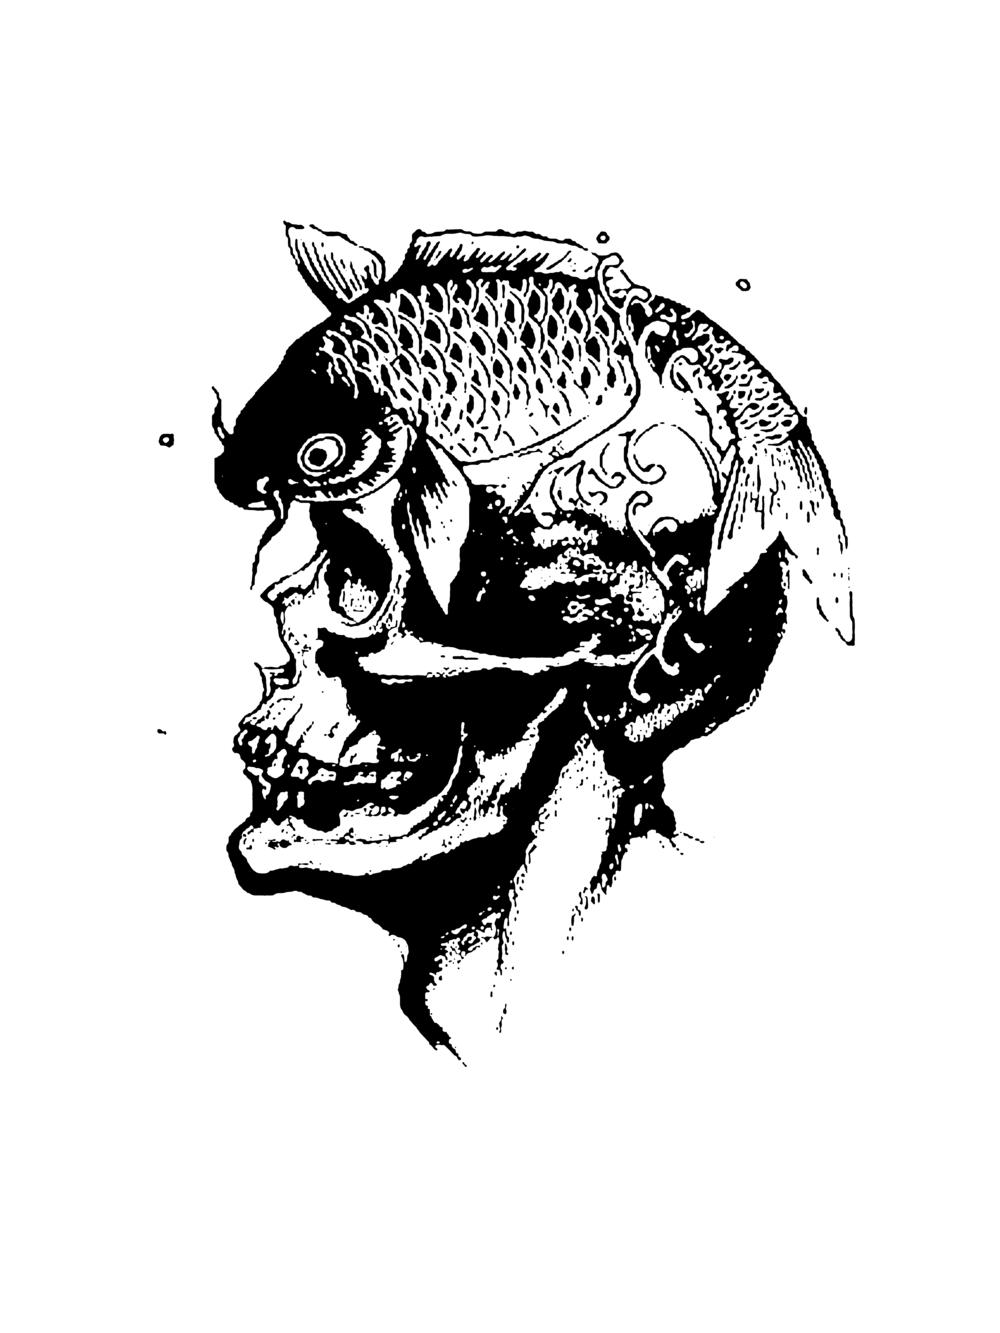 Fish_Head (2006).png